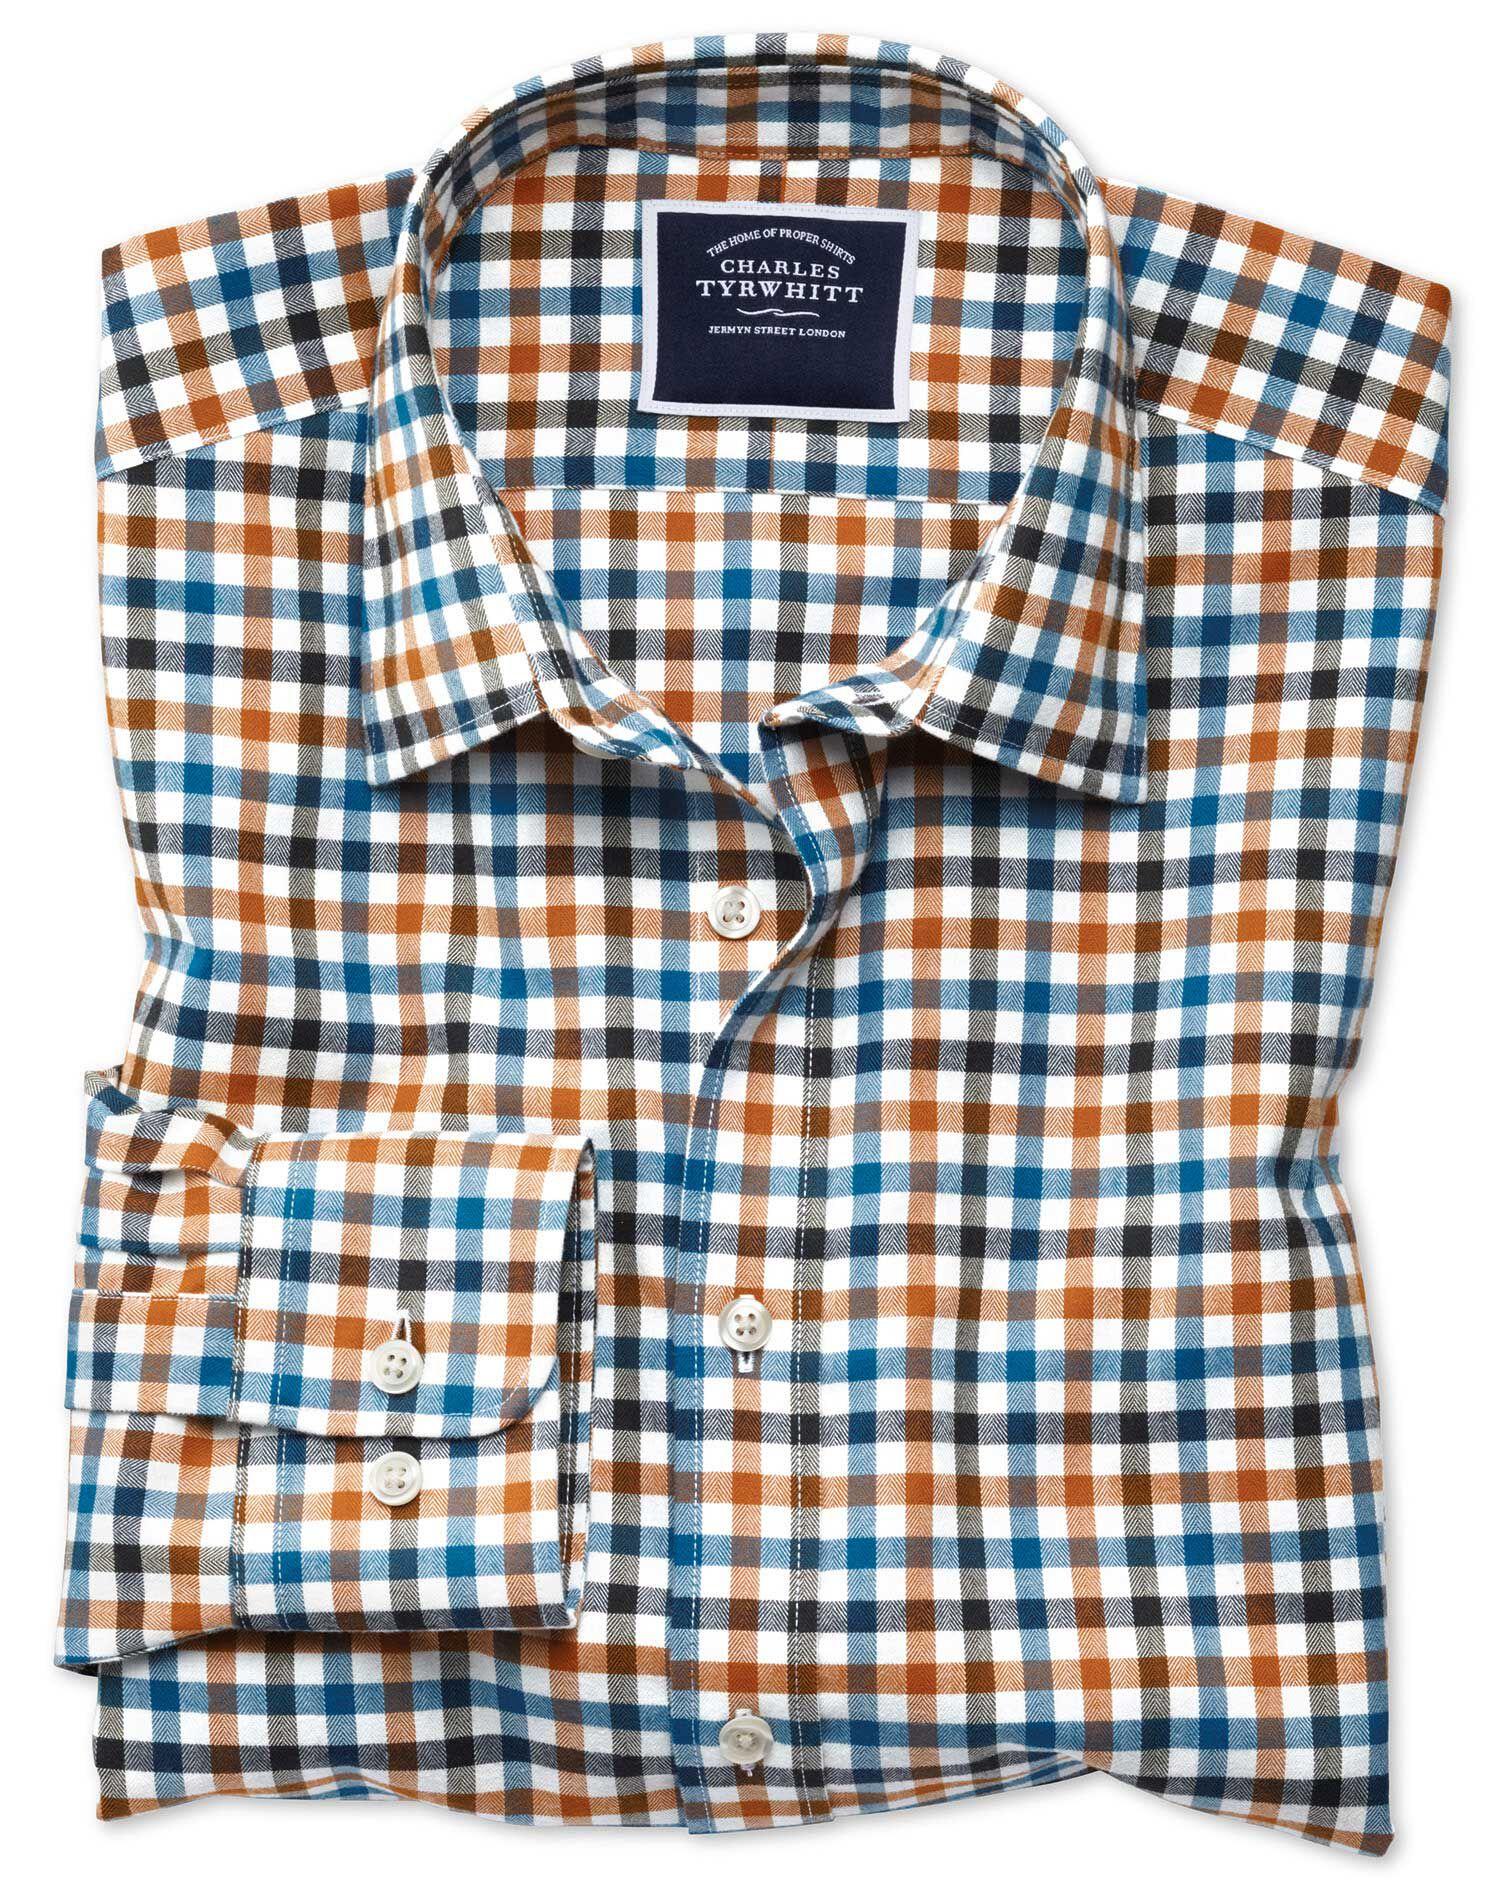 Shirts Impartial Classic Fit Blue Herringbone Plaid French Cuff Cotton Dress Shirt